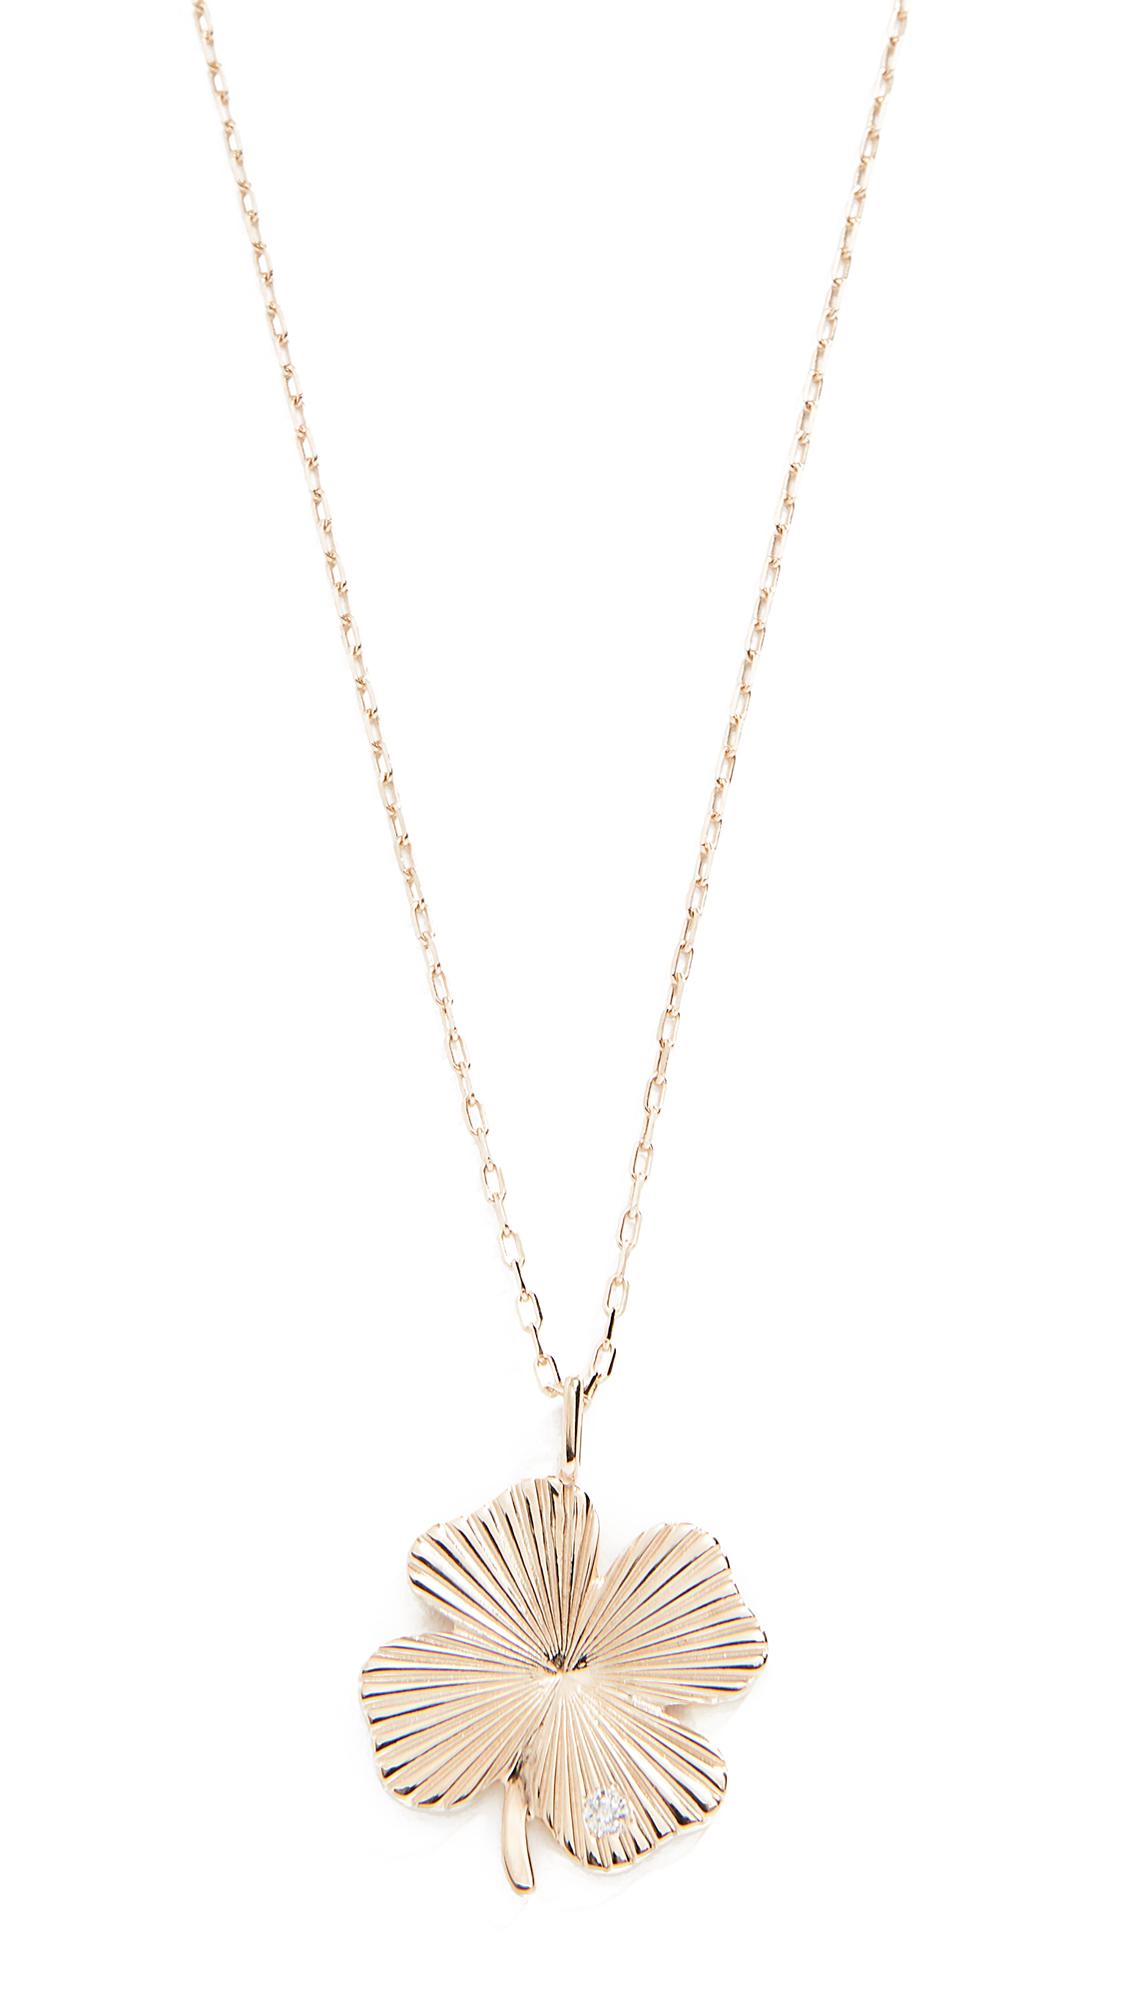 ADINA REYTER 14K Large Diamond Clover Necklace, Yellow Gold